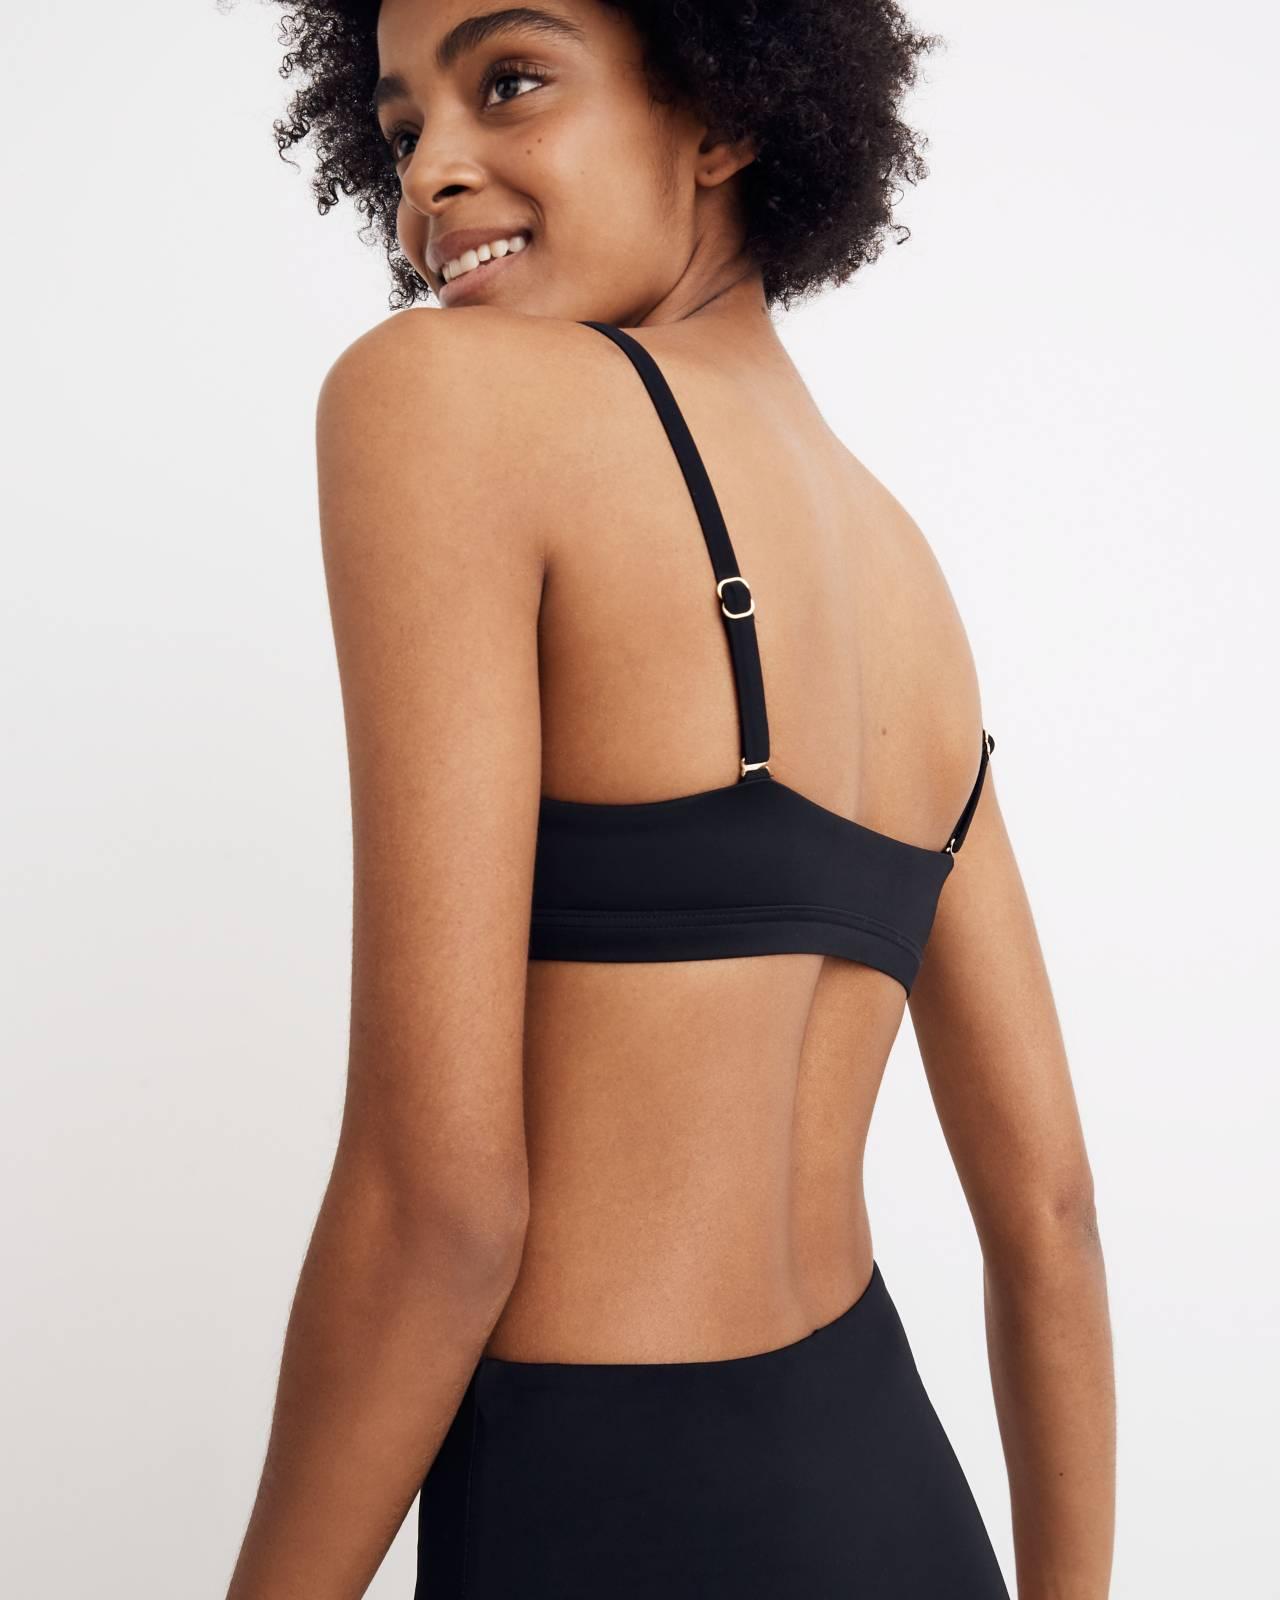 Madewell Second Wave Sport Bikini Top in true black image 3